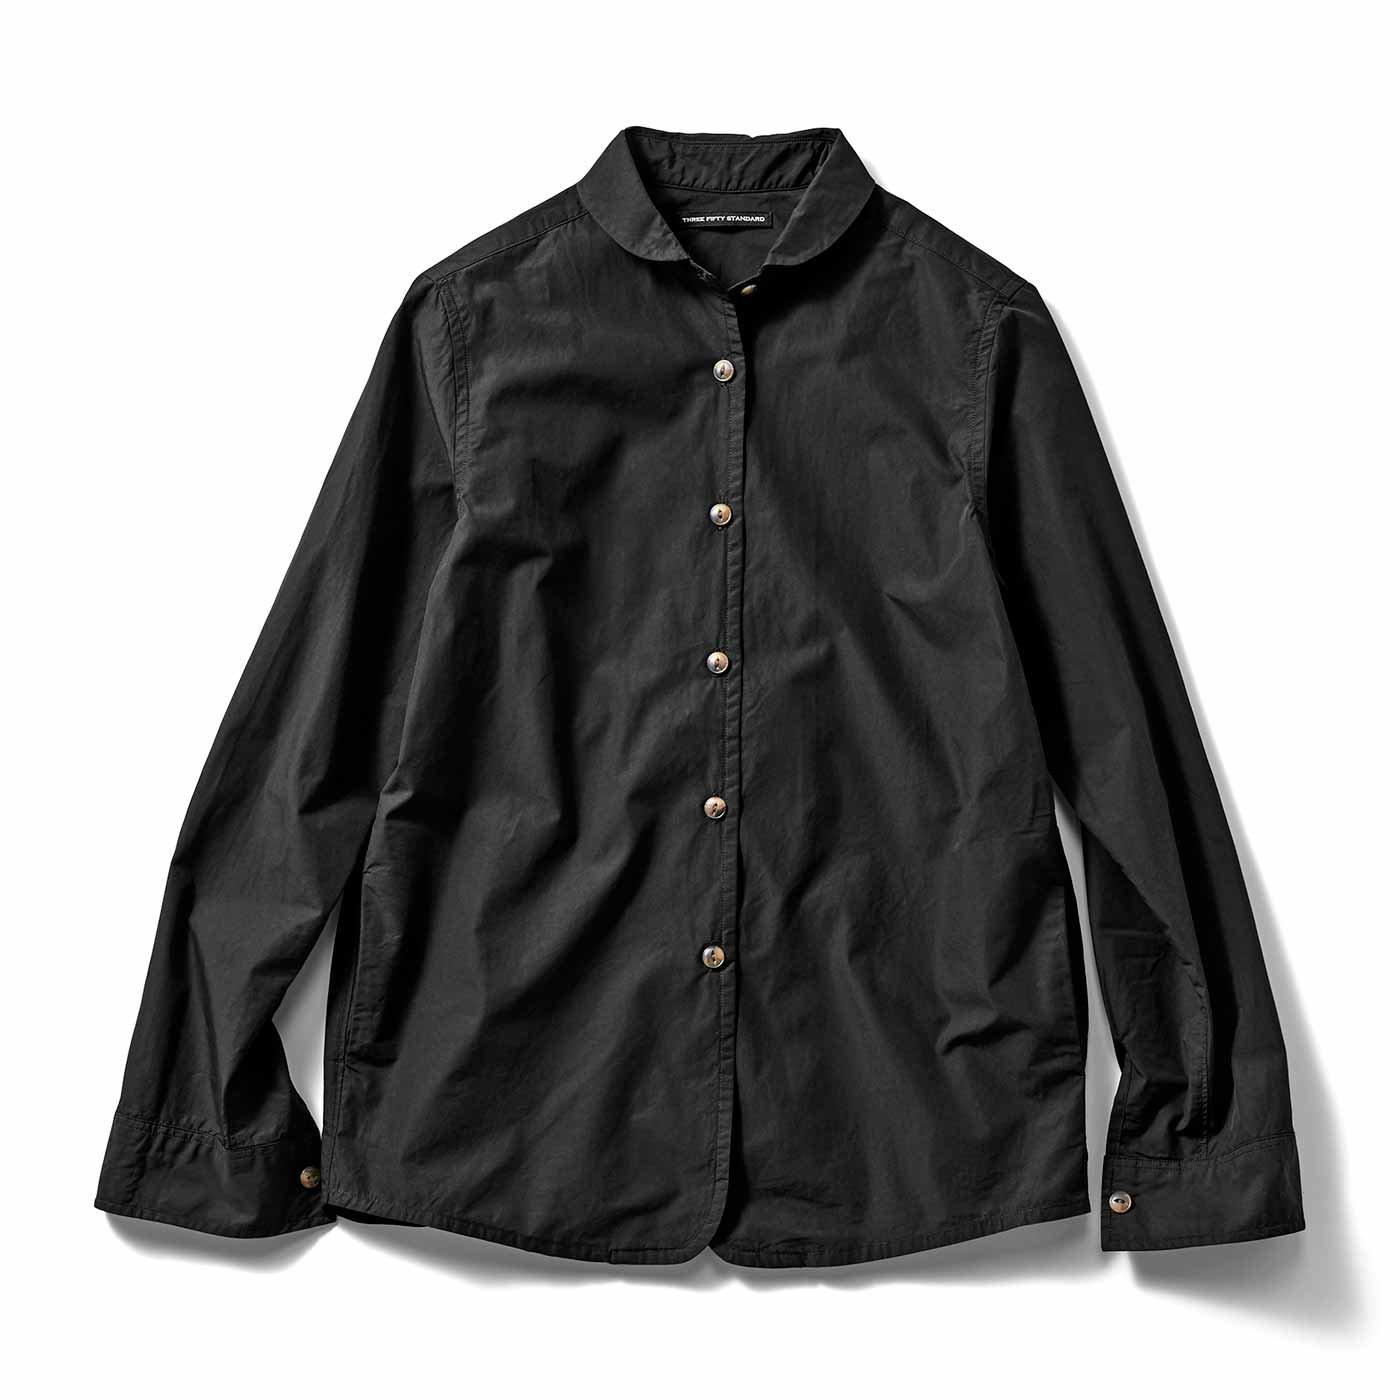 THREE FIFTY STANDARD ジャケットみたいに着こなすブラックシャツ